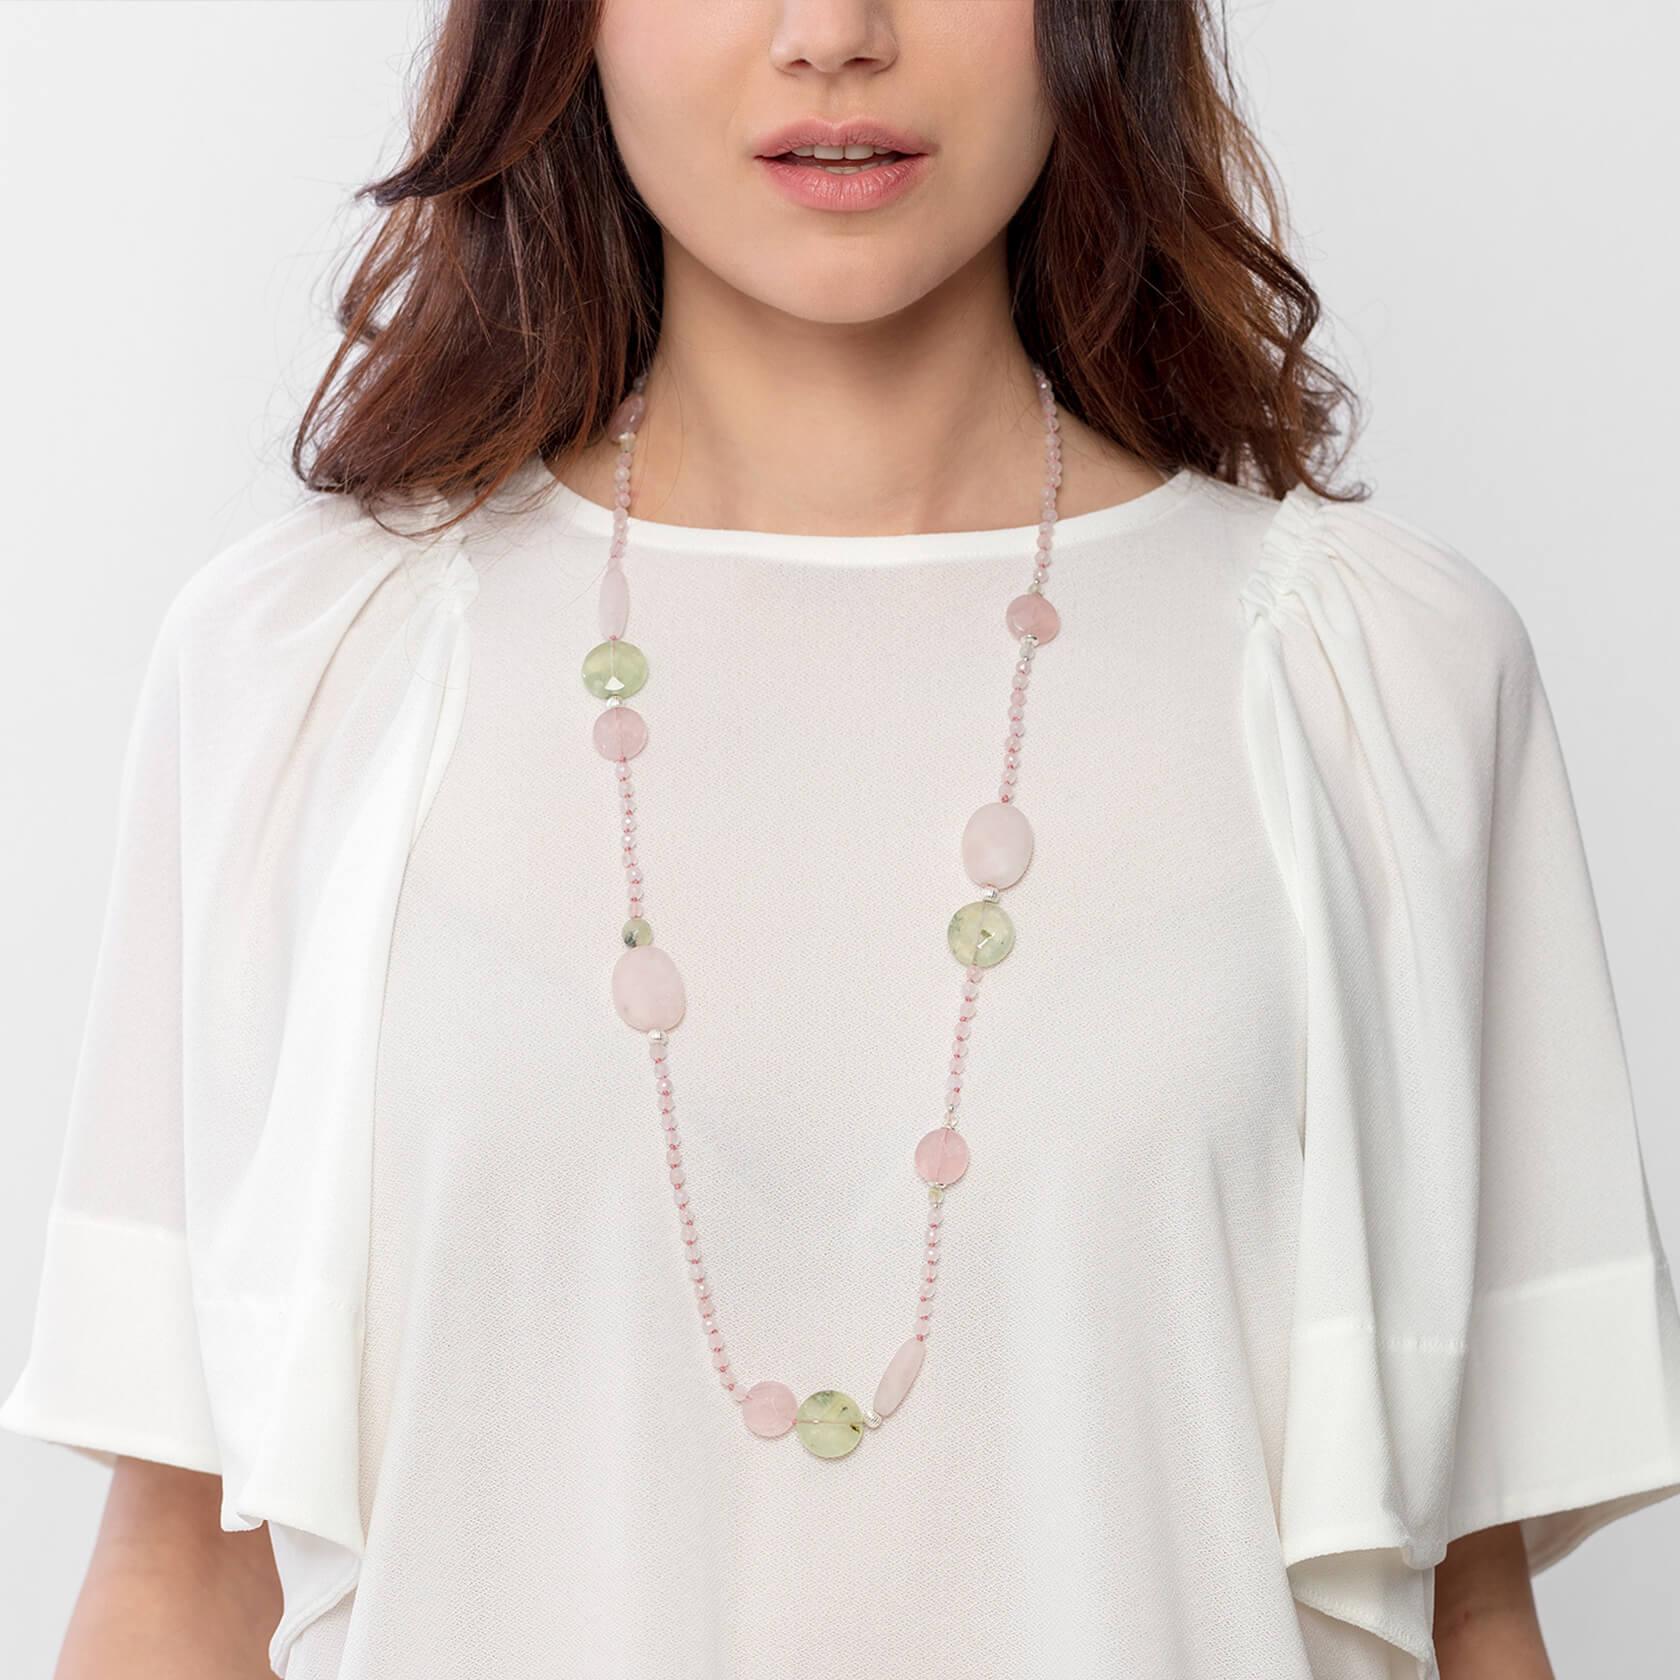 marybola long mate rose quartz necklace